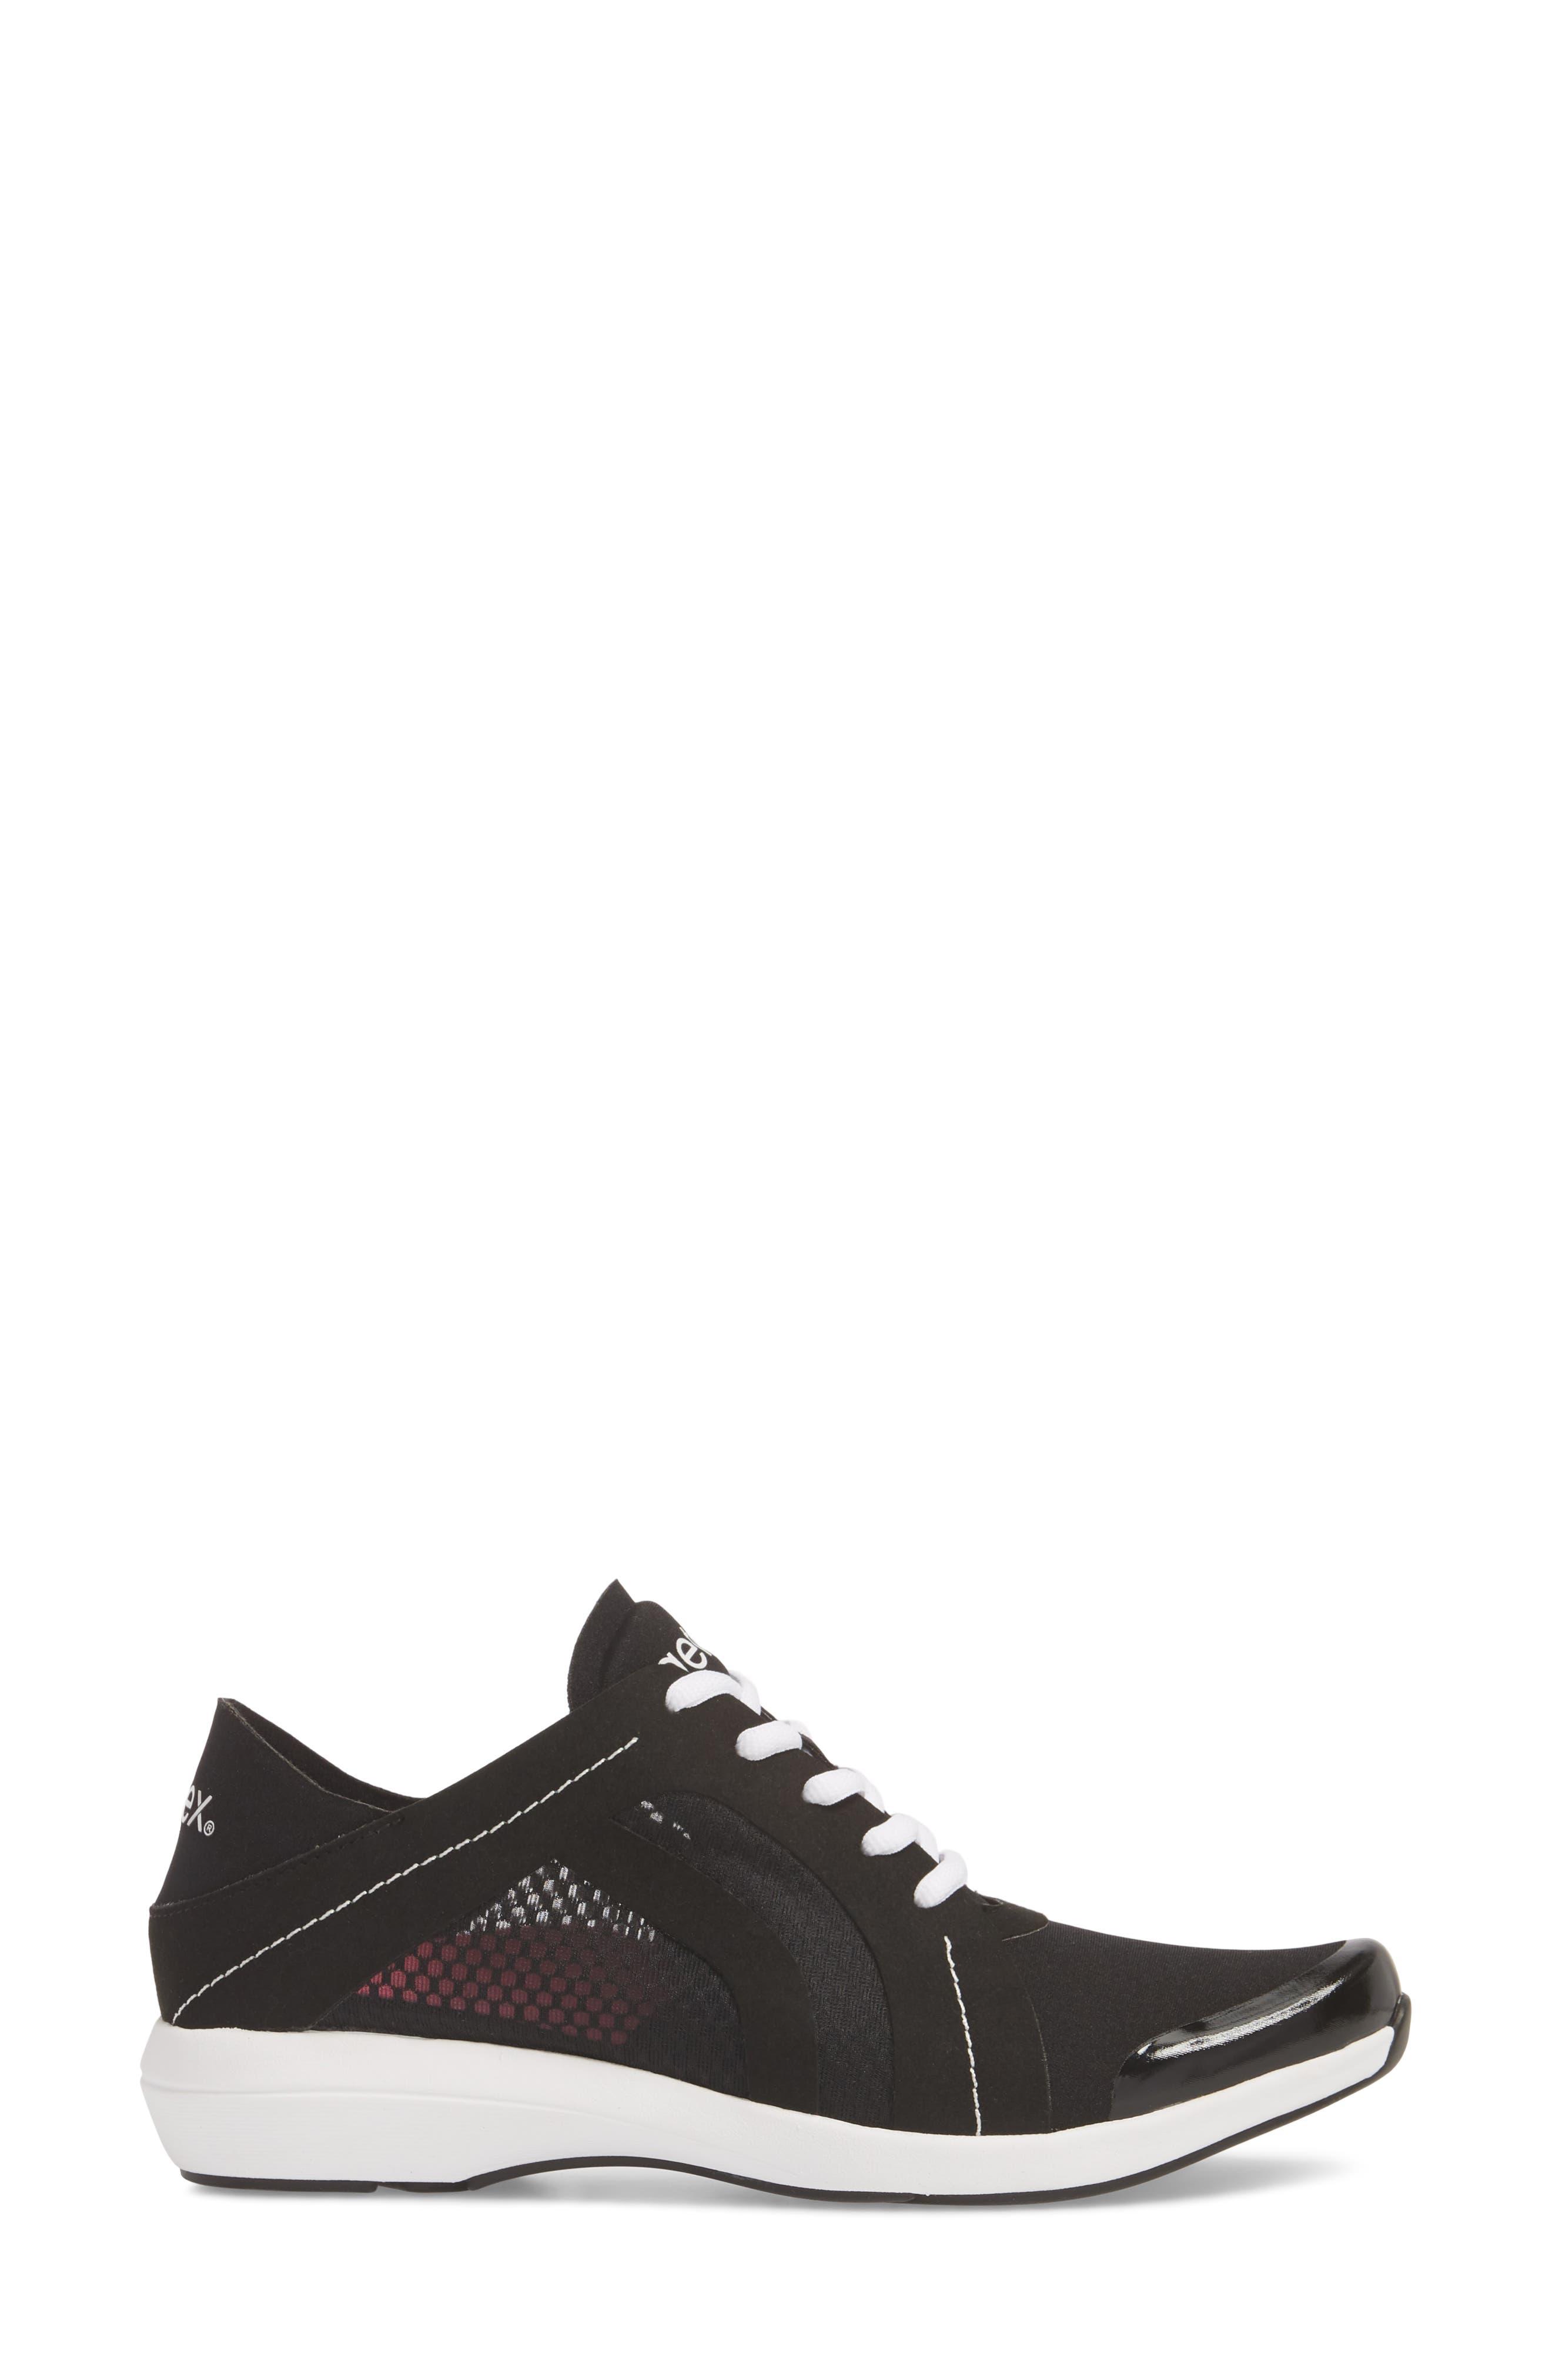 Sloane Sneaker,                             Alternate thumbnail 3, color,                             BLACK FABRIC